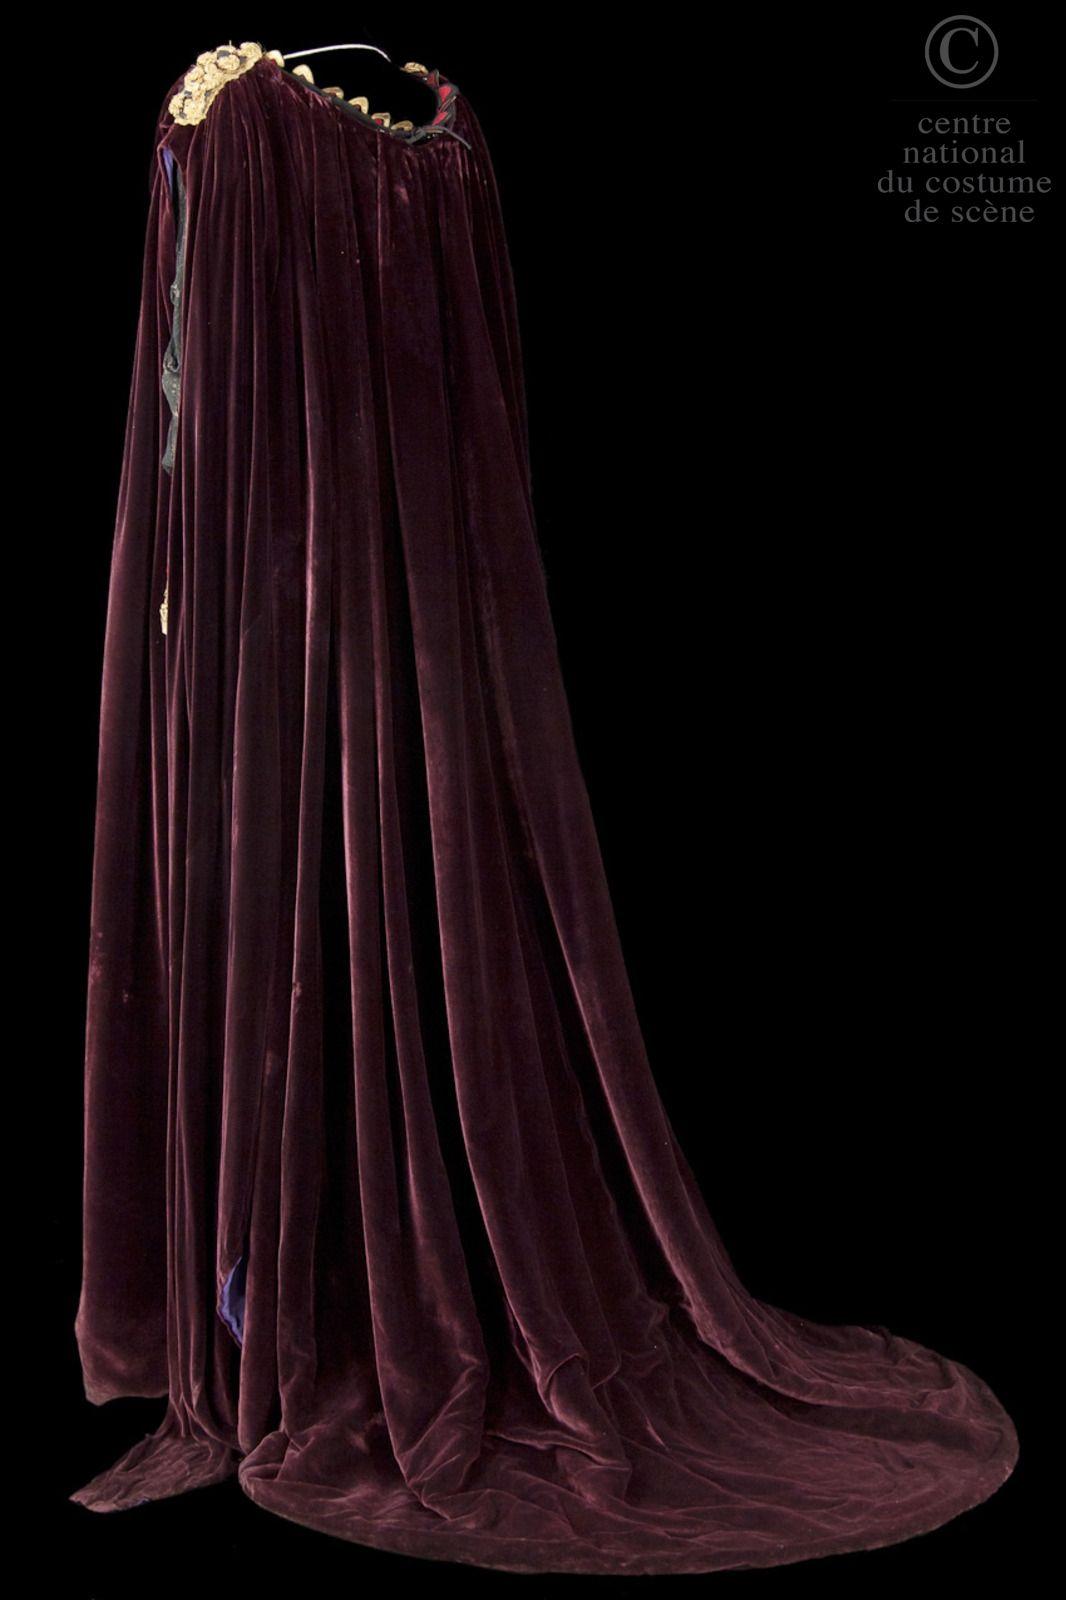 Costume designed by Francine Gaillard-Risler for Annie Ducaux in the 1961 production of Jean Racine's Britannicus  From the Centre National du Costume de Scene